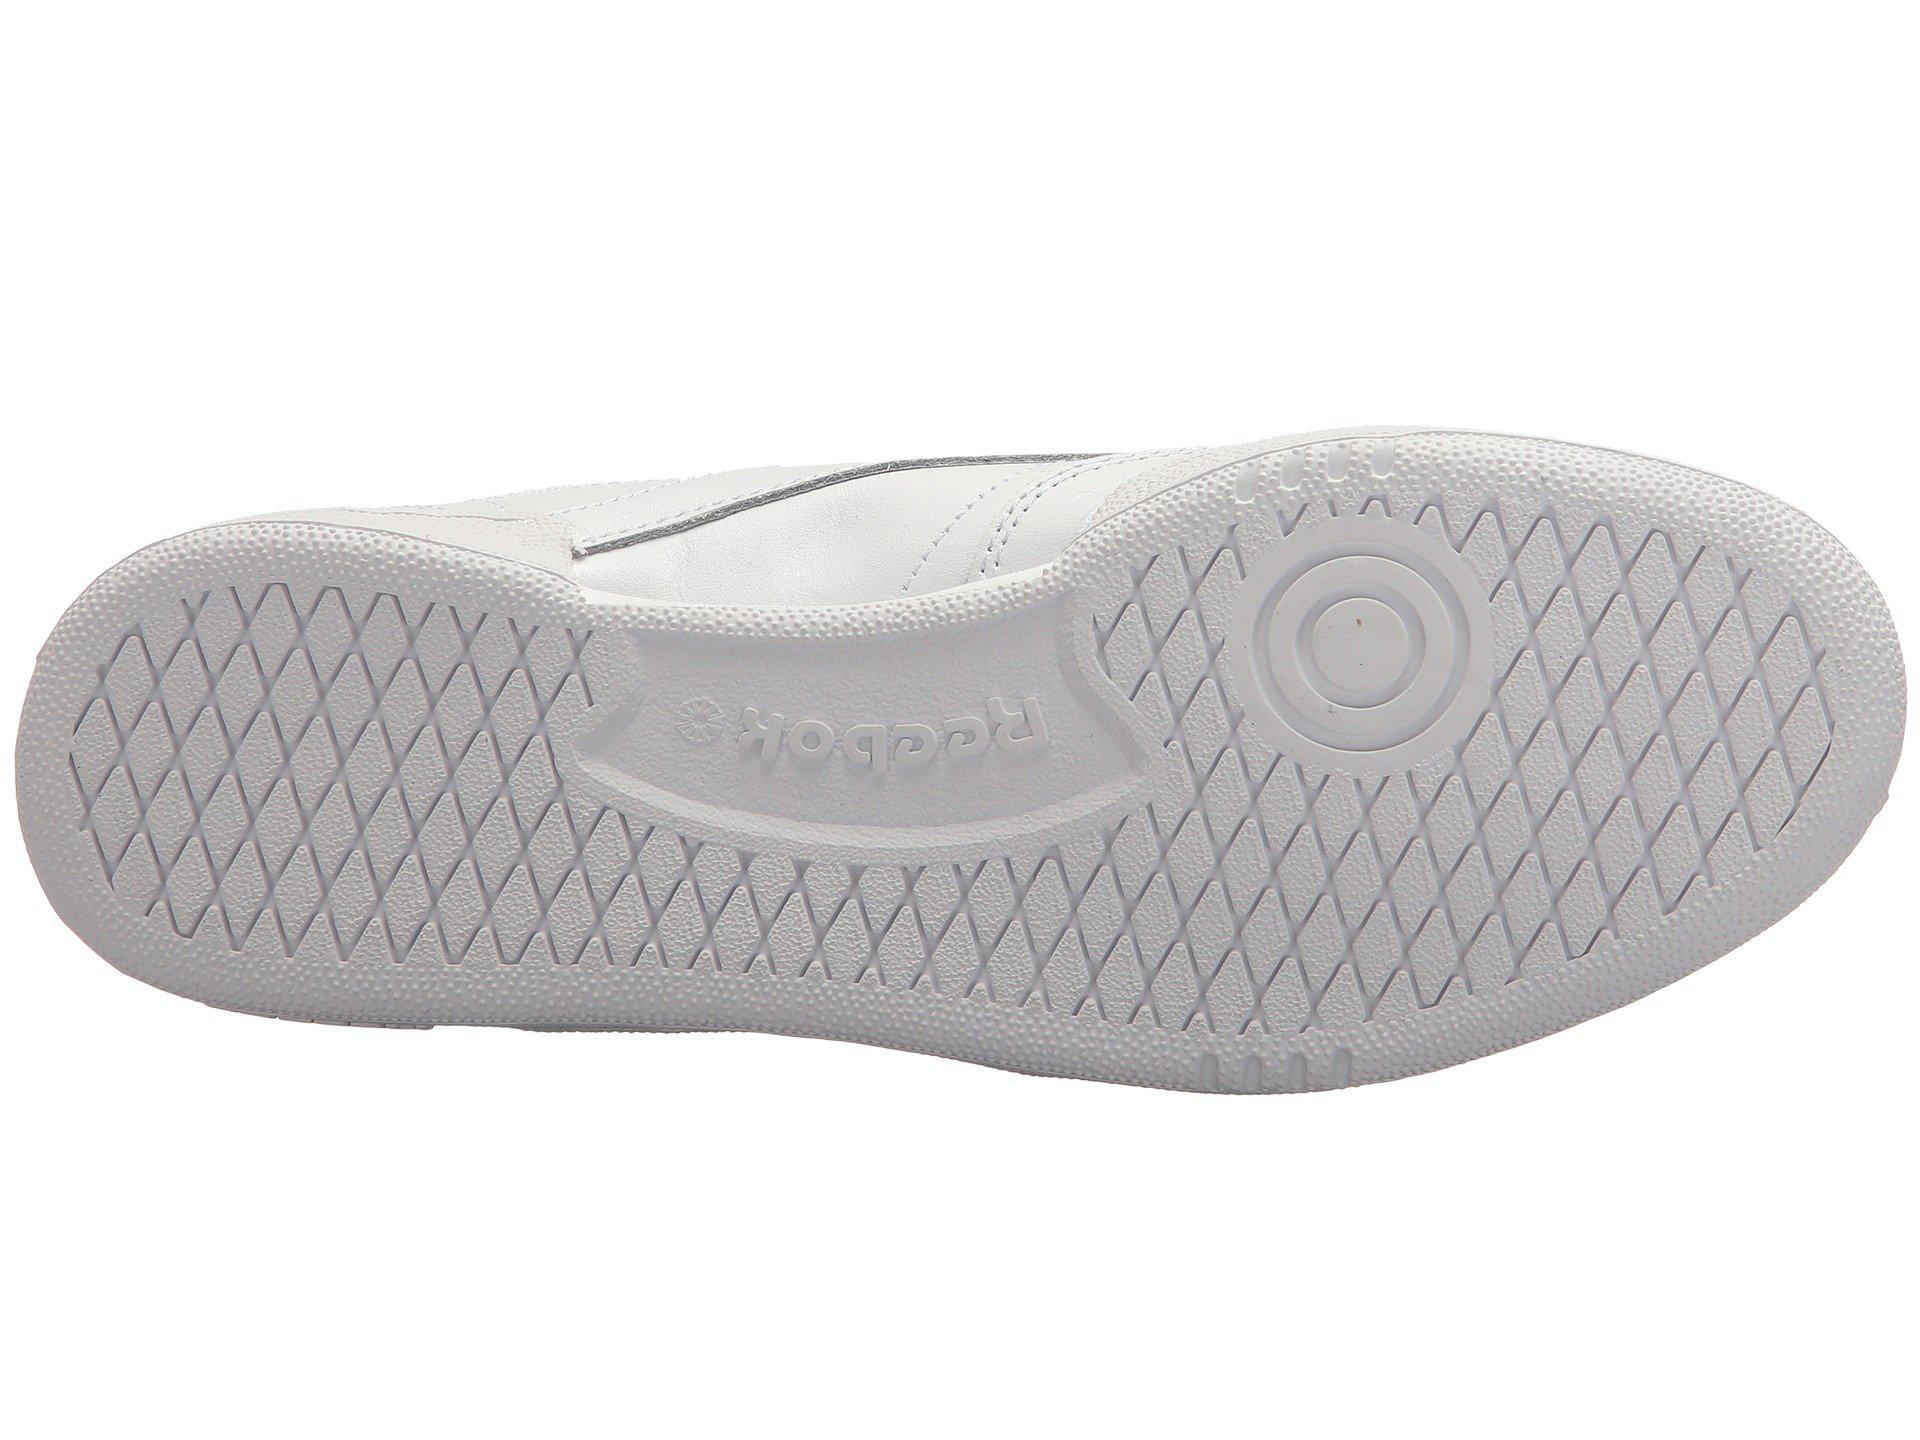 33c1132fb89 Reebok - Gray Club C 85 (white light Grey gum) Women s Shoes. View  fullscreen